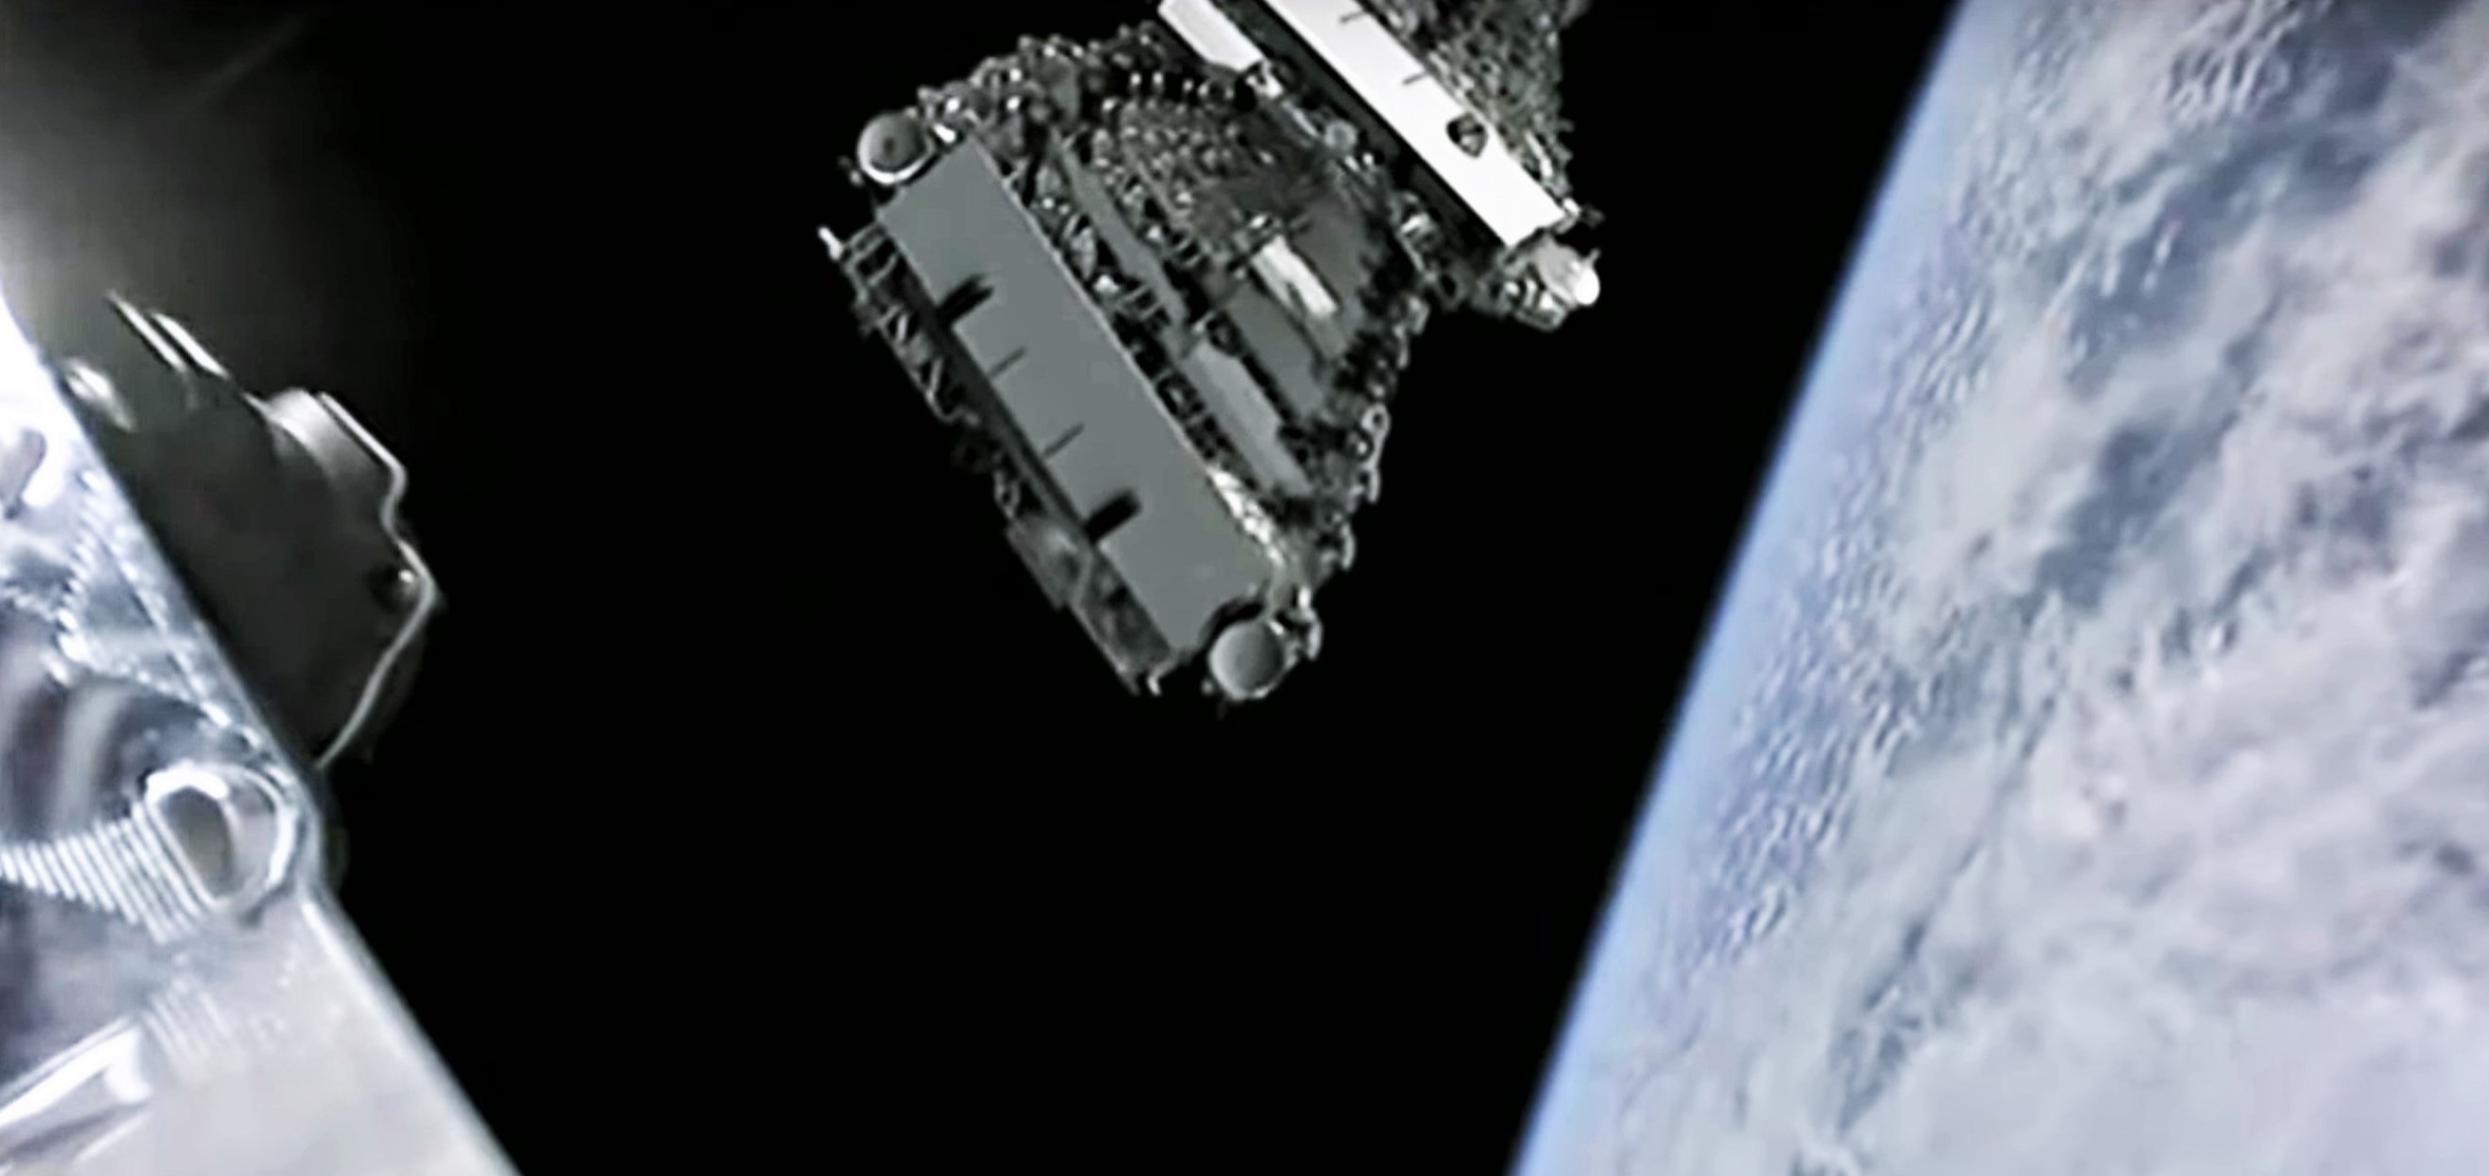 Starlink V1 L4 B1056 webcast (SpaceX) deployment 2